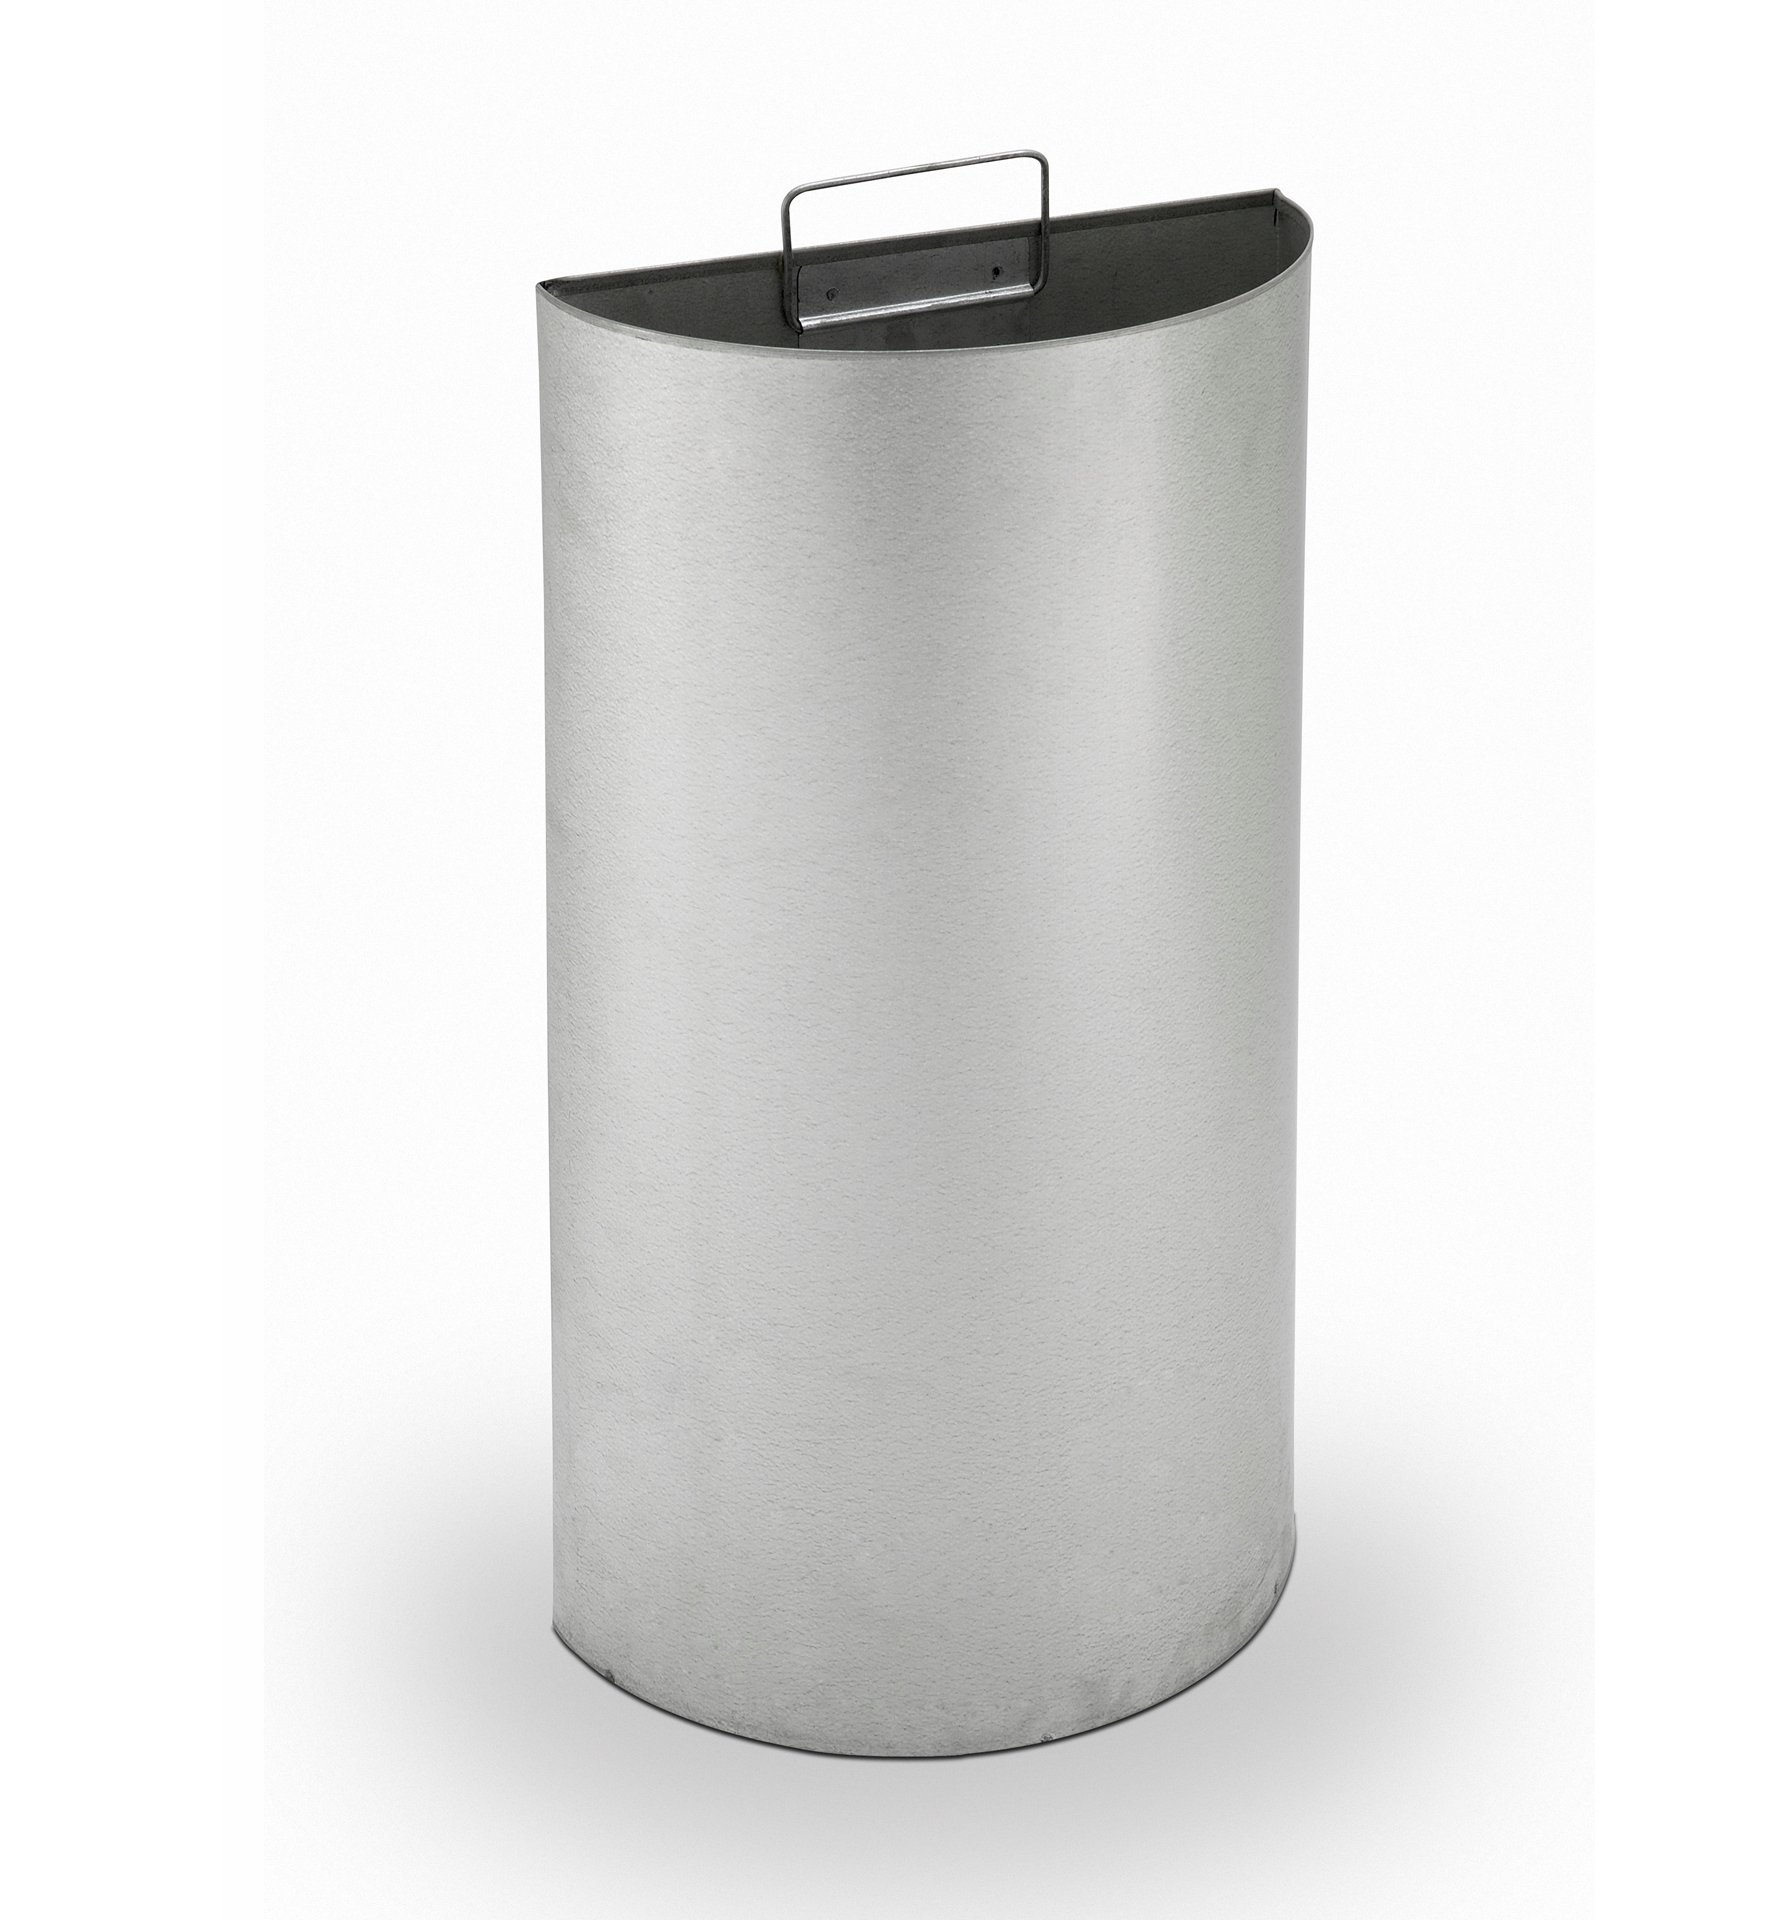 15 Gallon Precision Half Moon Stainless Steel Trash